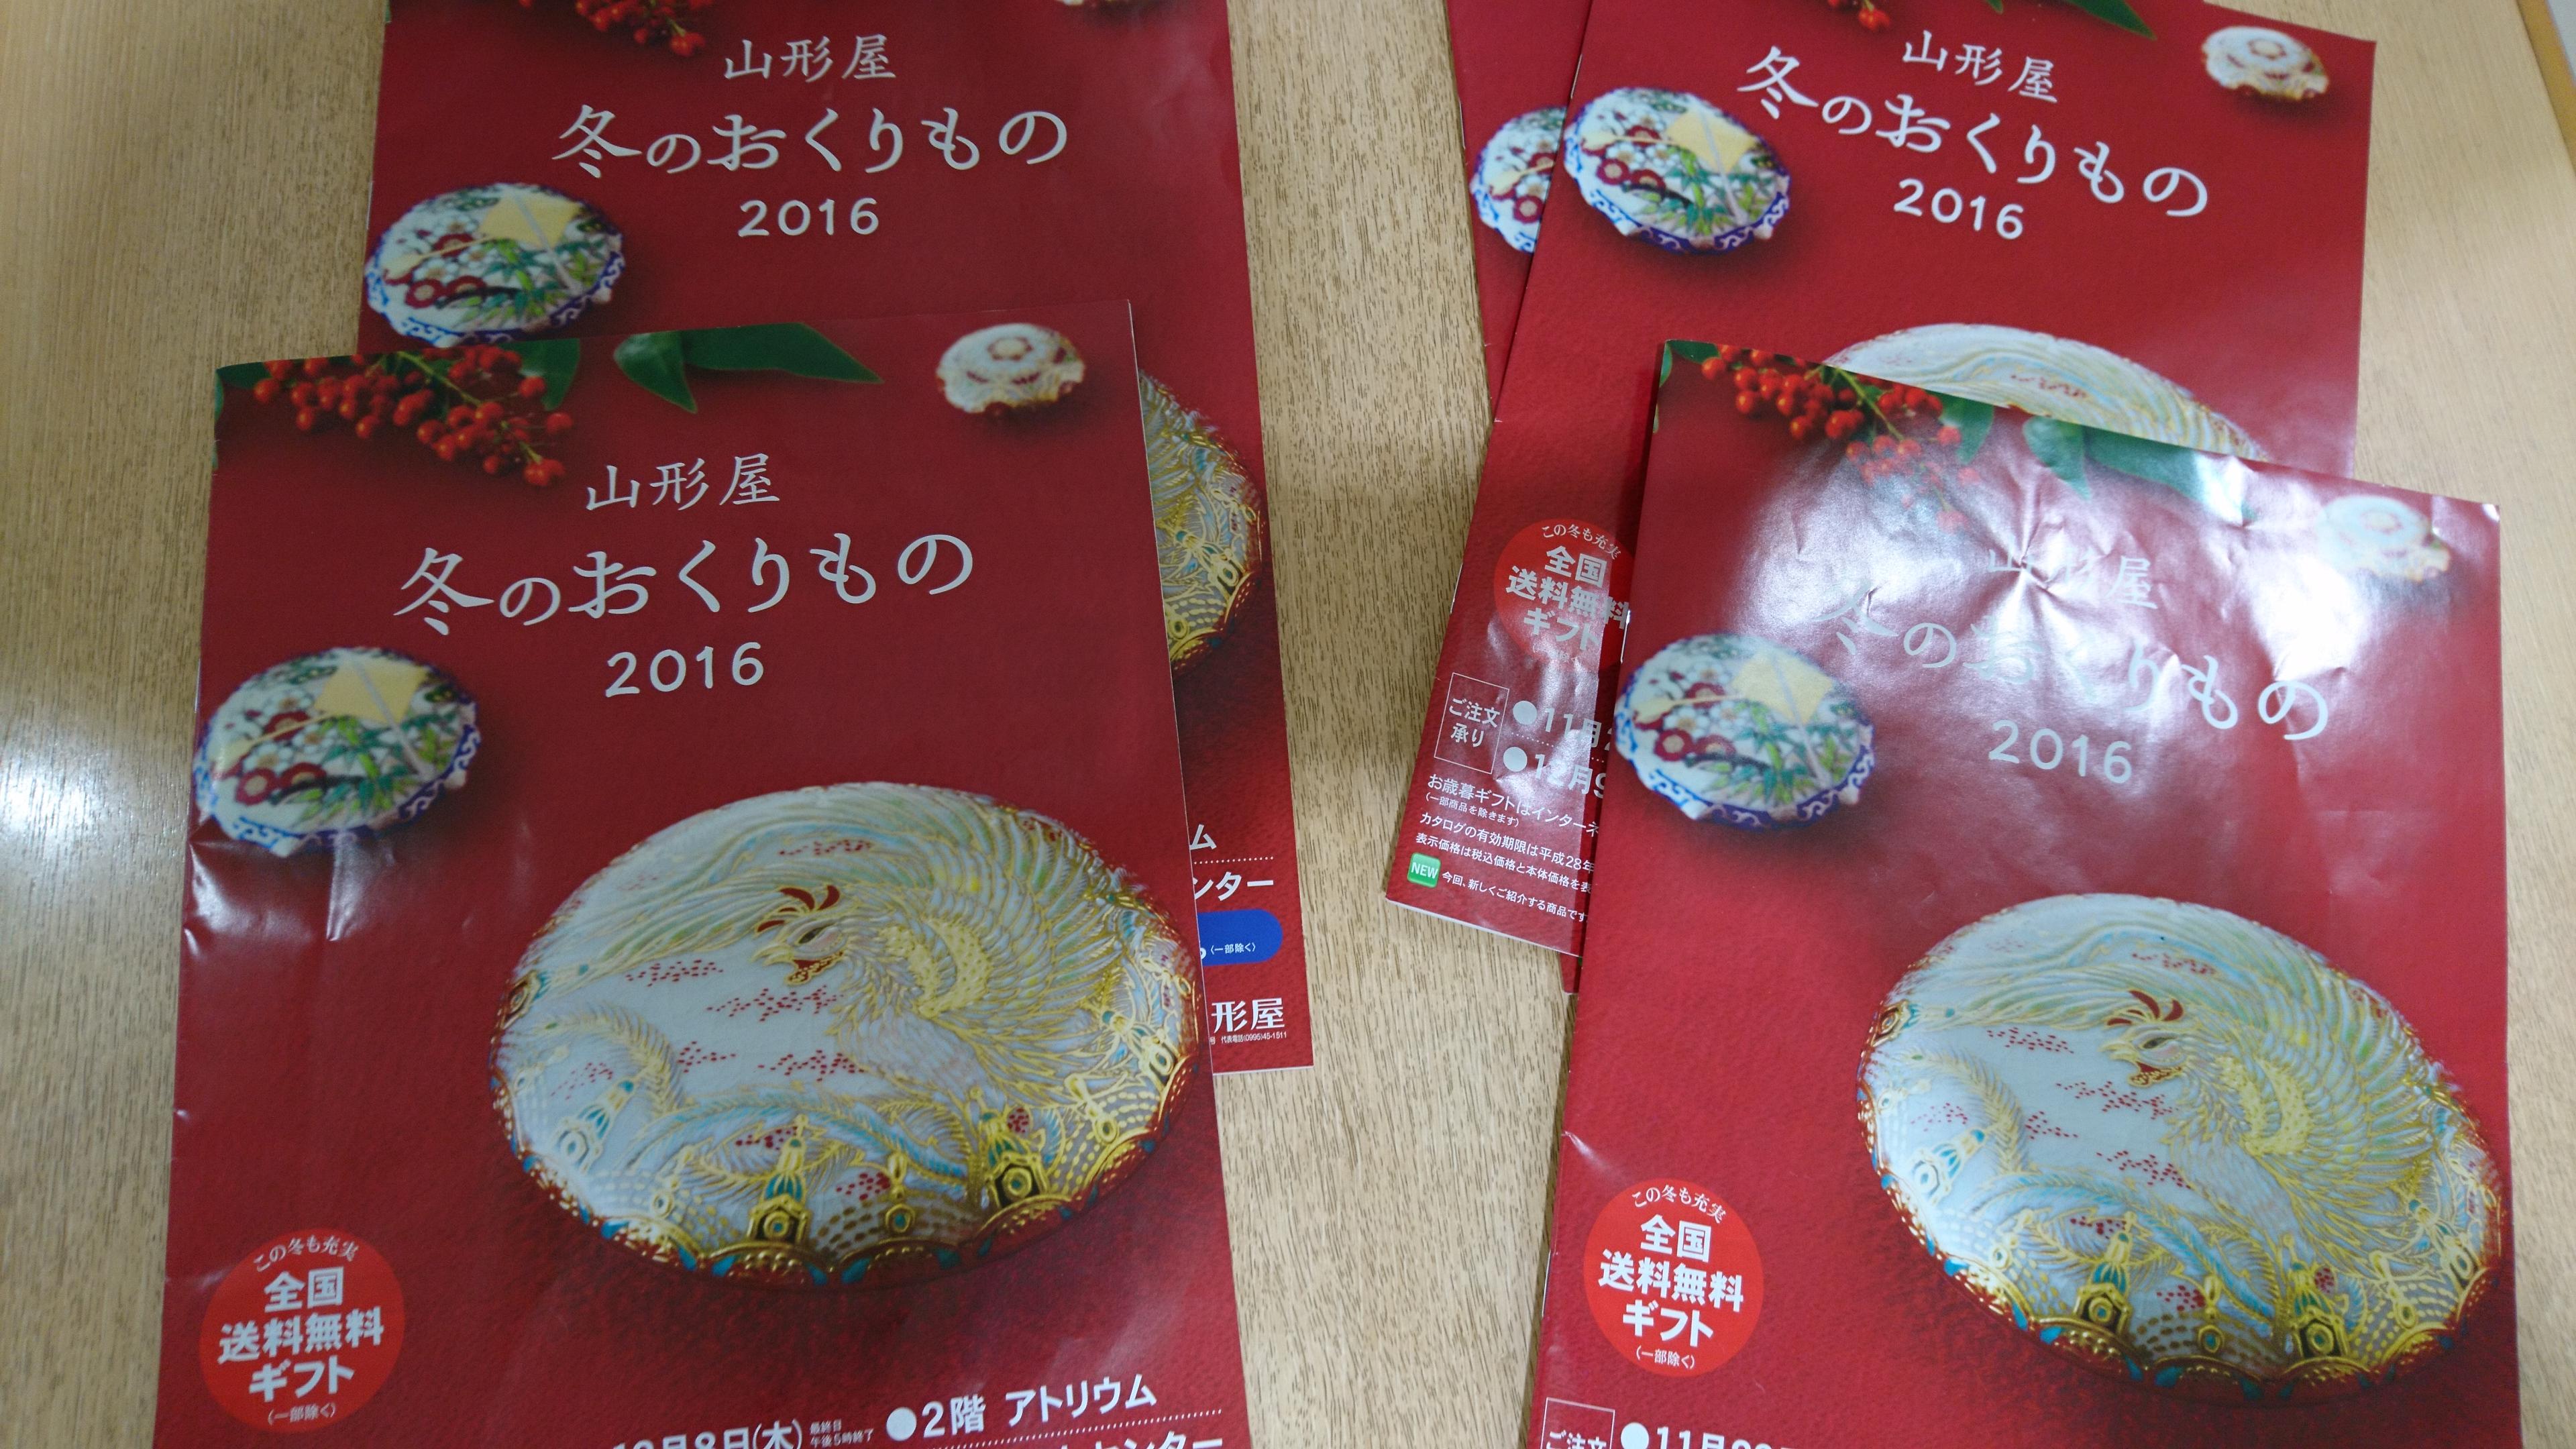 http://hashiguchi-seikotu.com/blog/about/DSC_0292.JPG